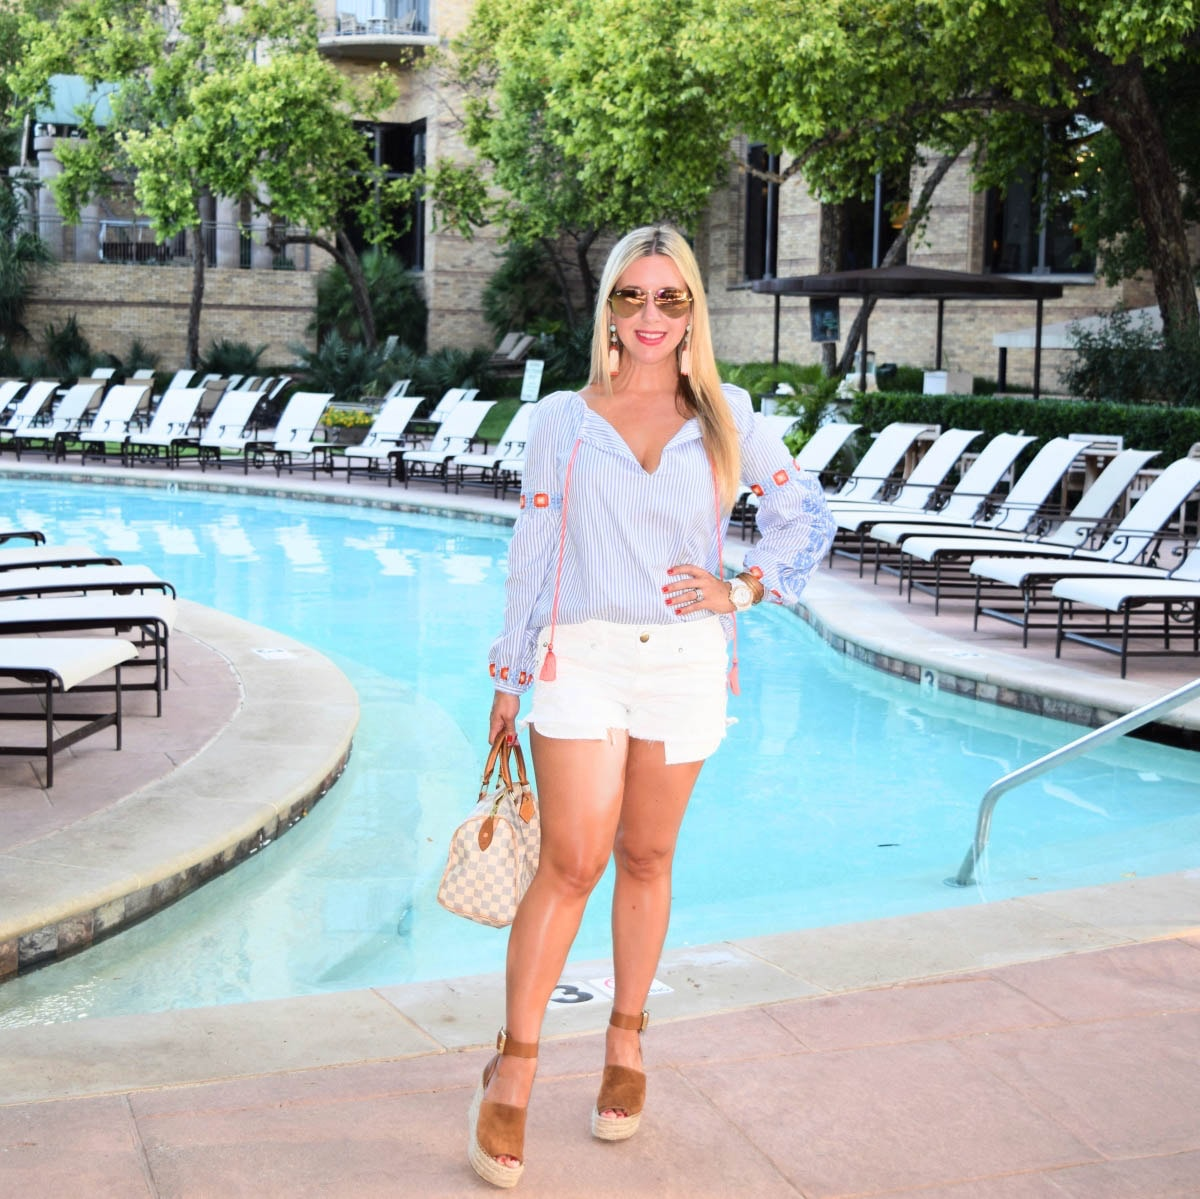 Tory Burch Summer Tunic- Fashion & Lifestyle Blogger in Dallas